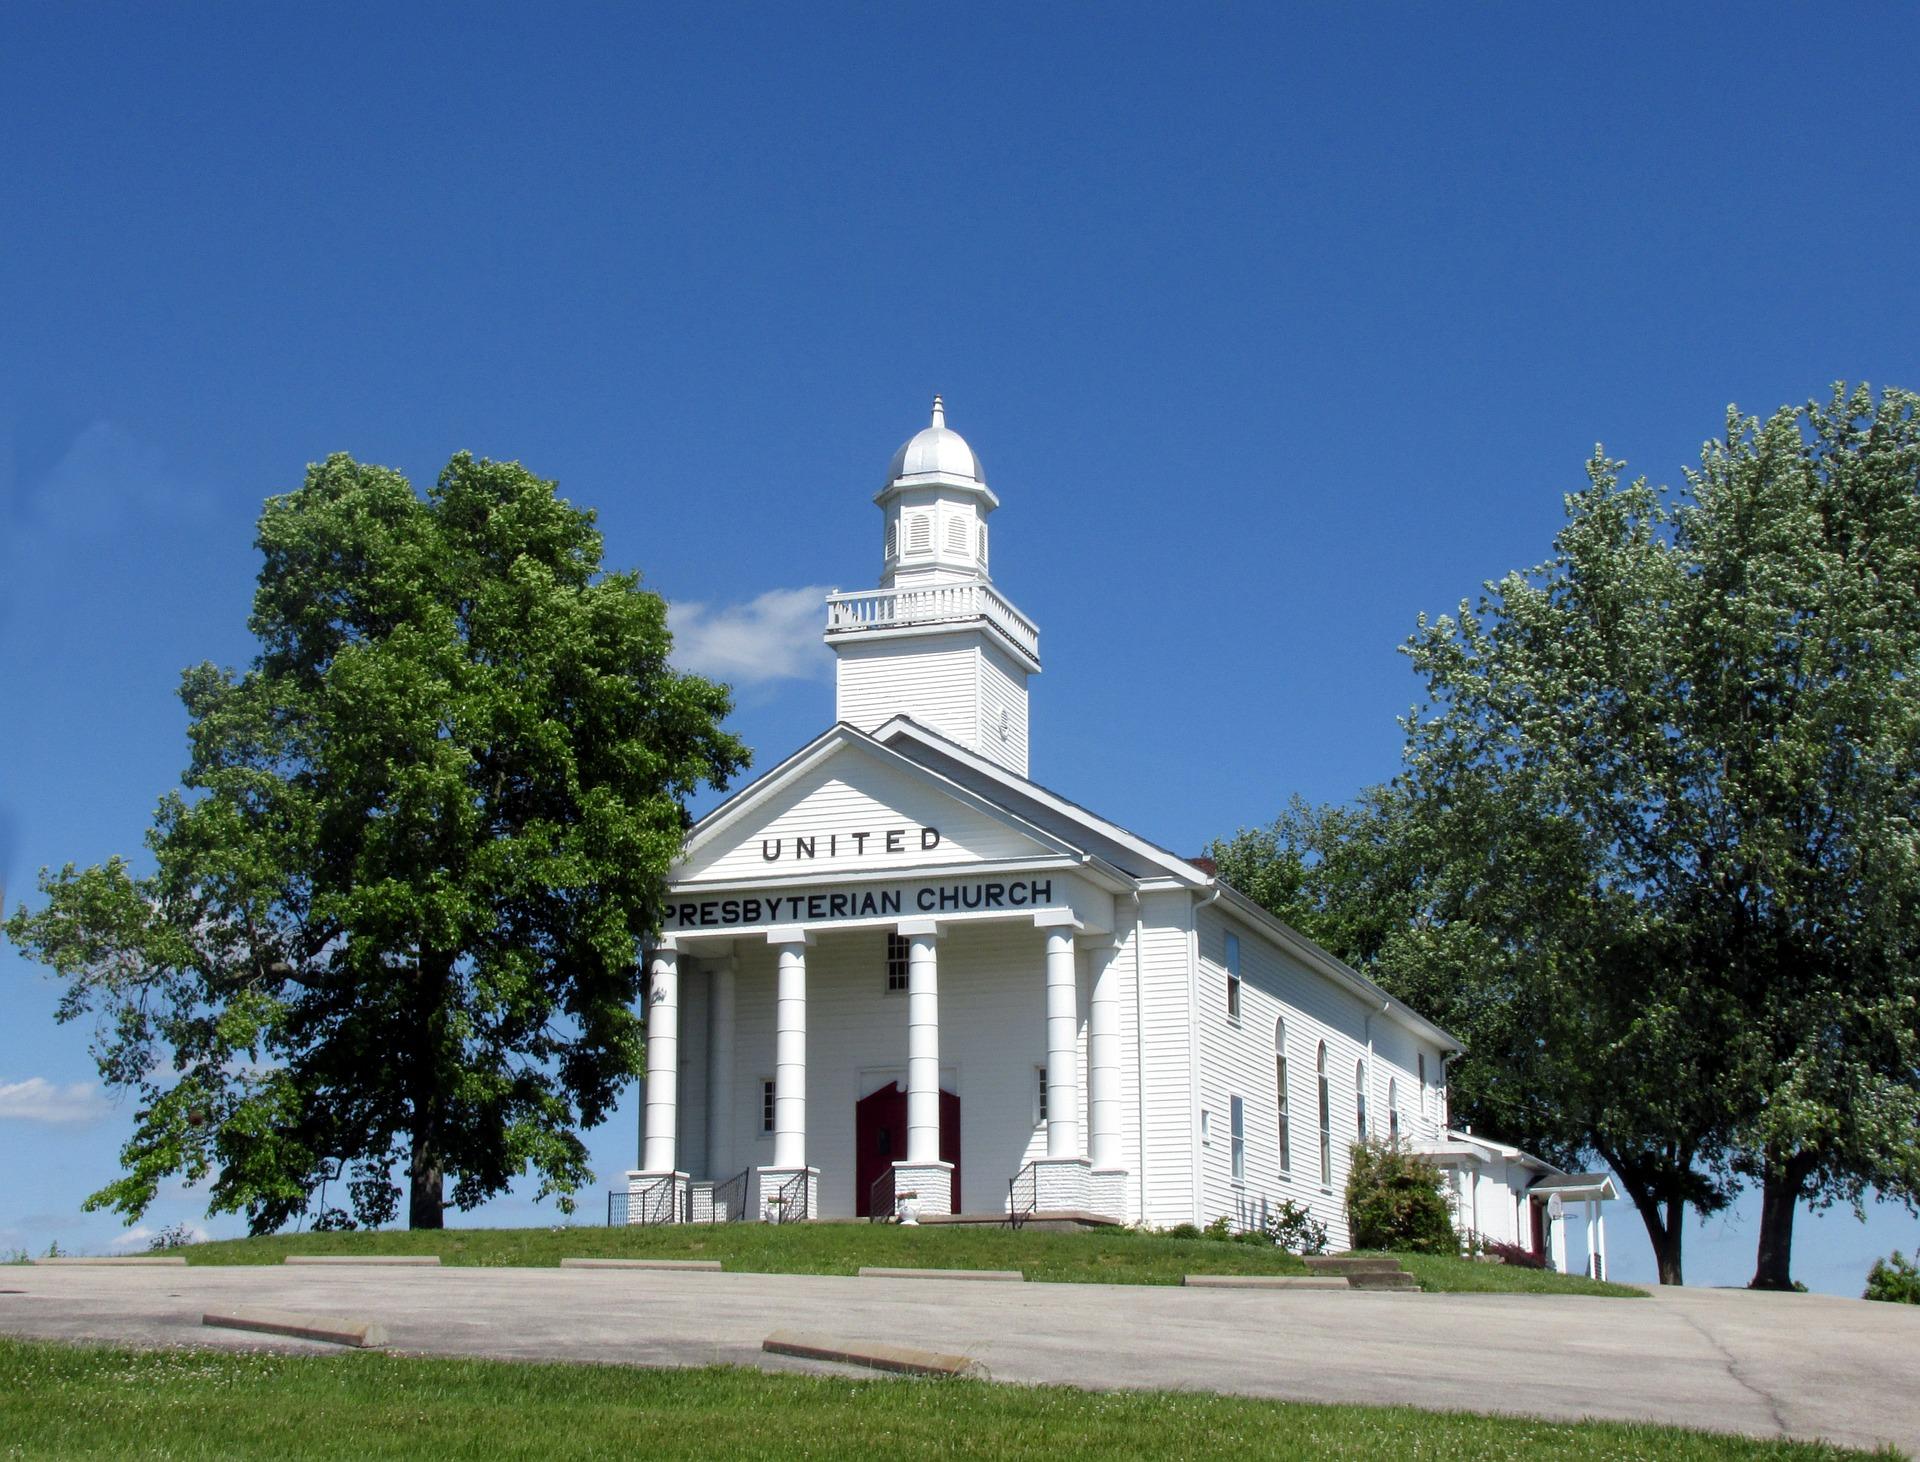 presbyterian-church-381646_1920.jpg